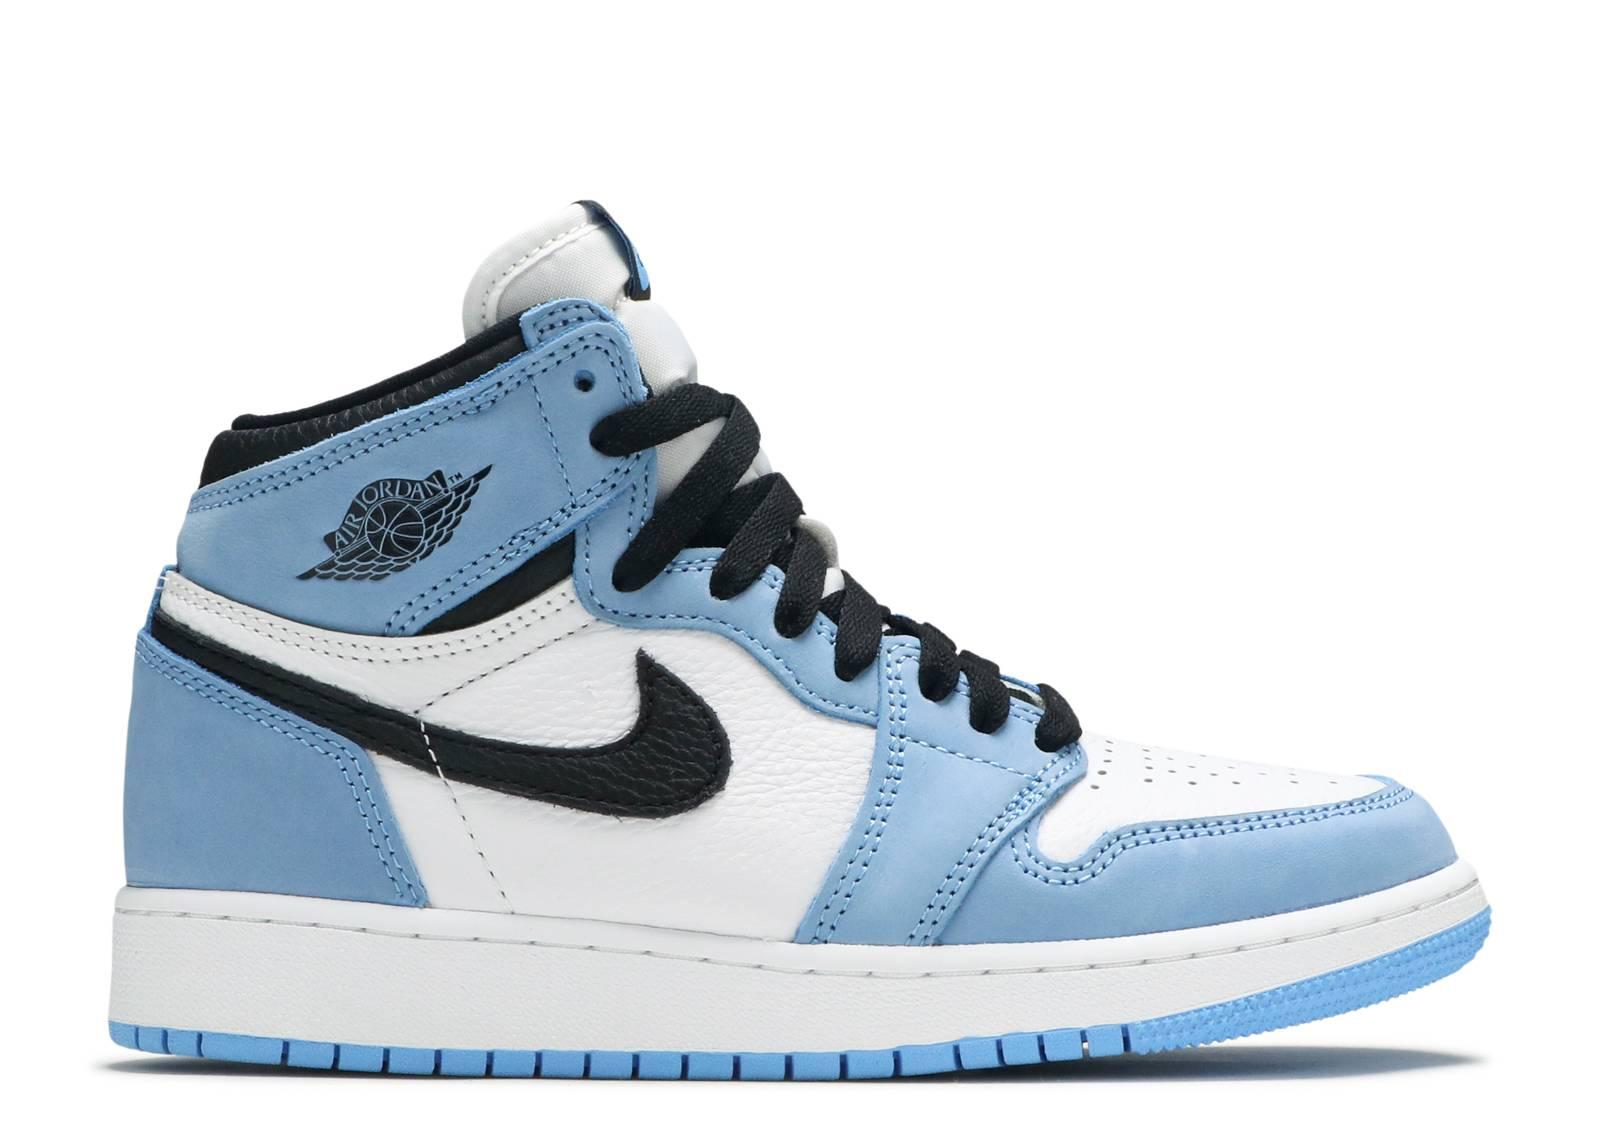 High Top Air Jordan Sneakers | Flight Club